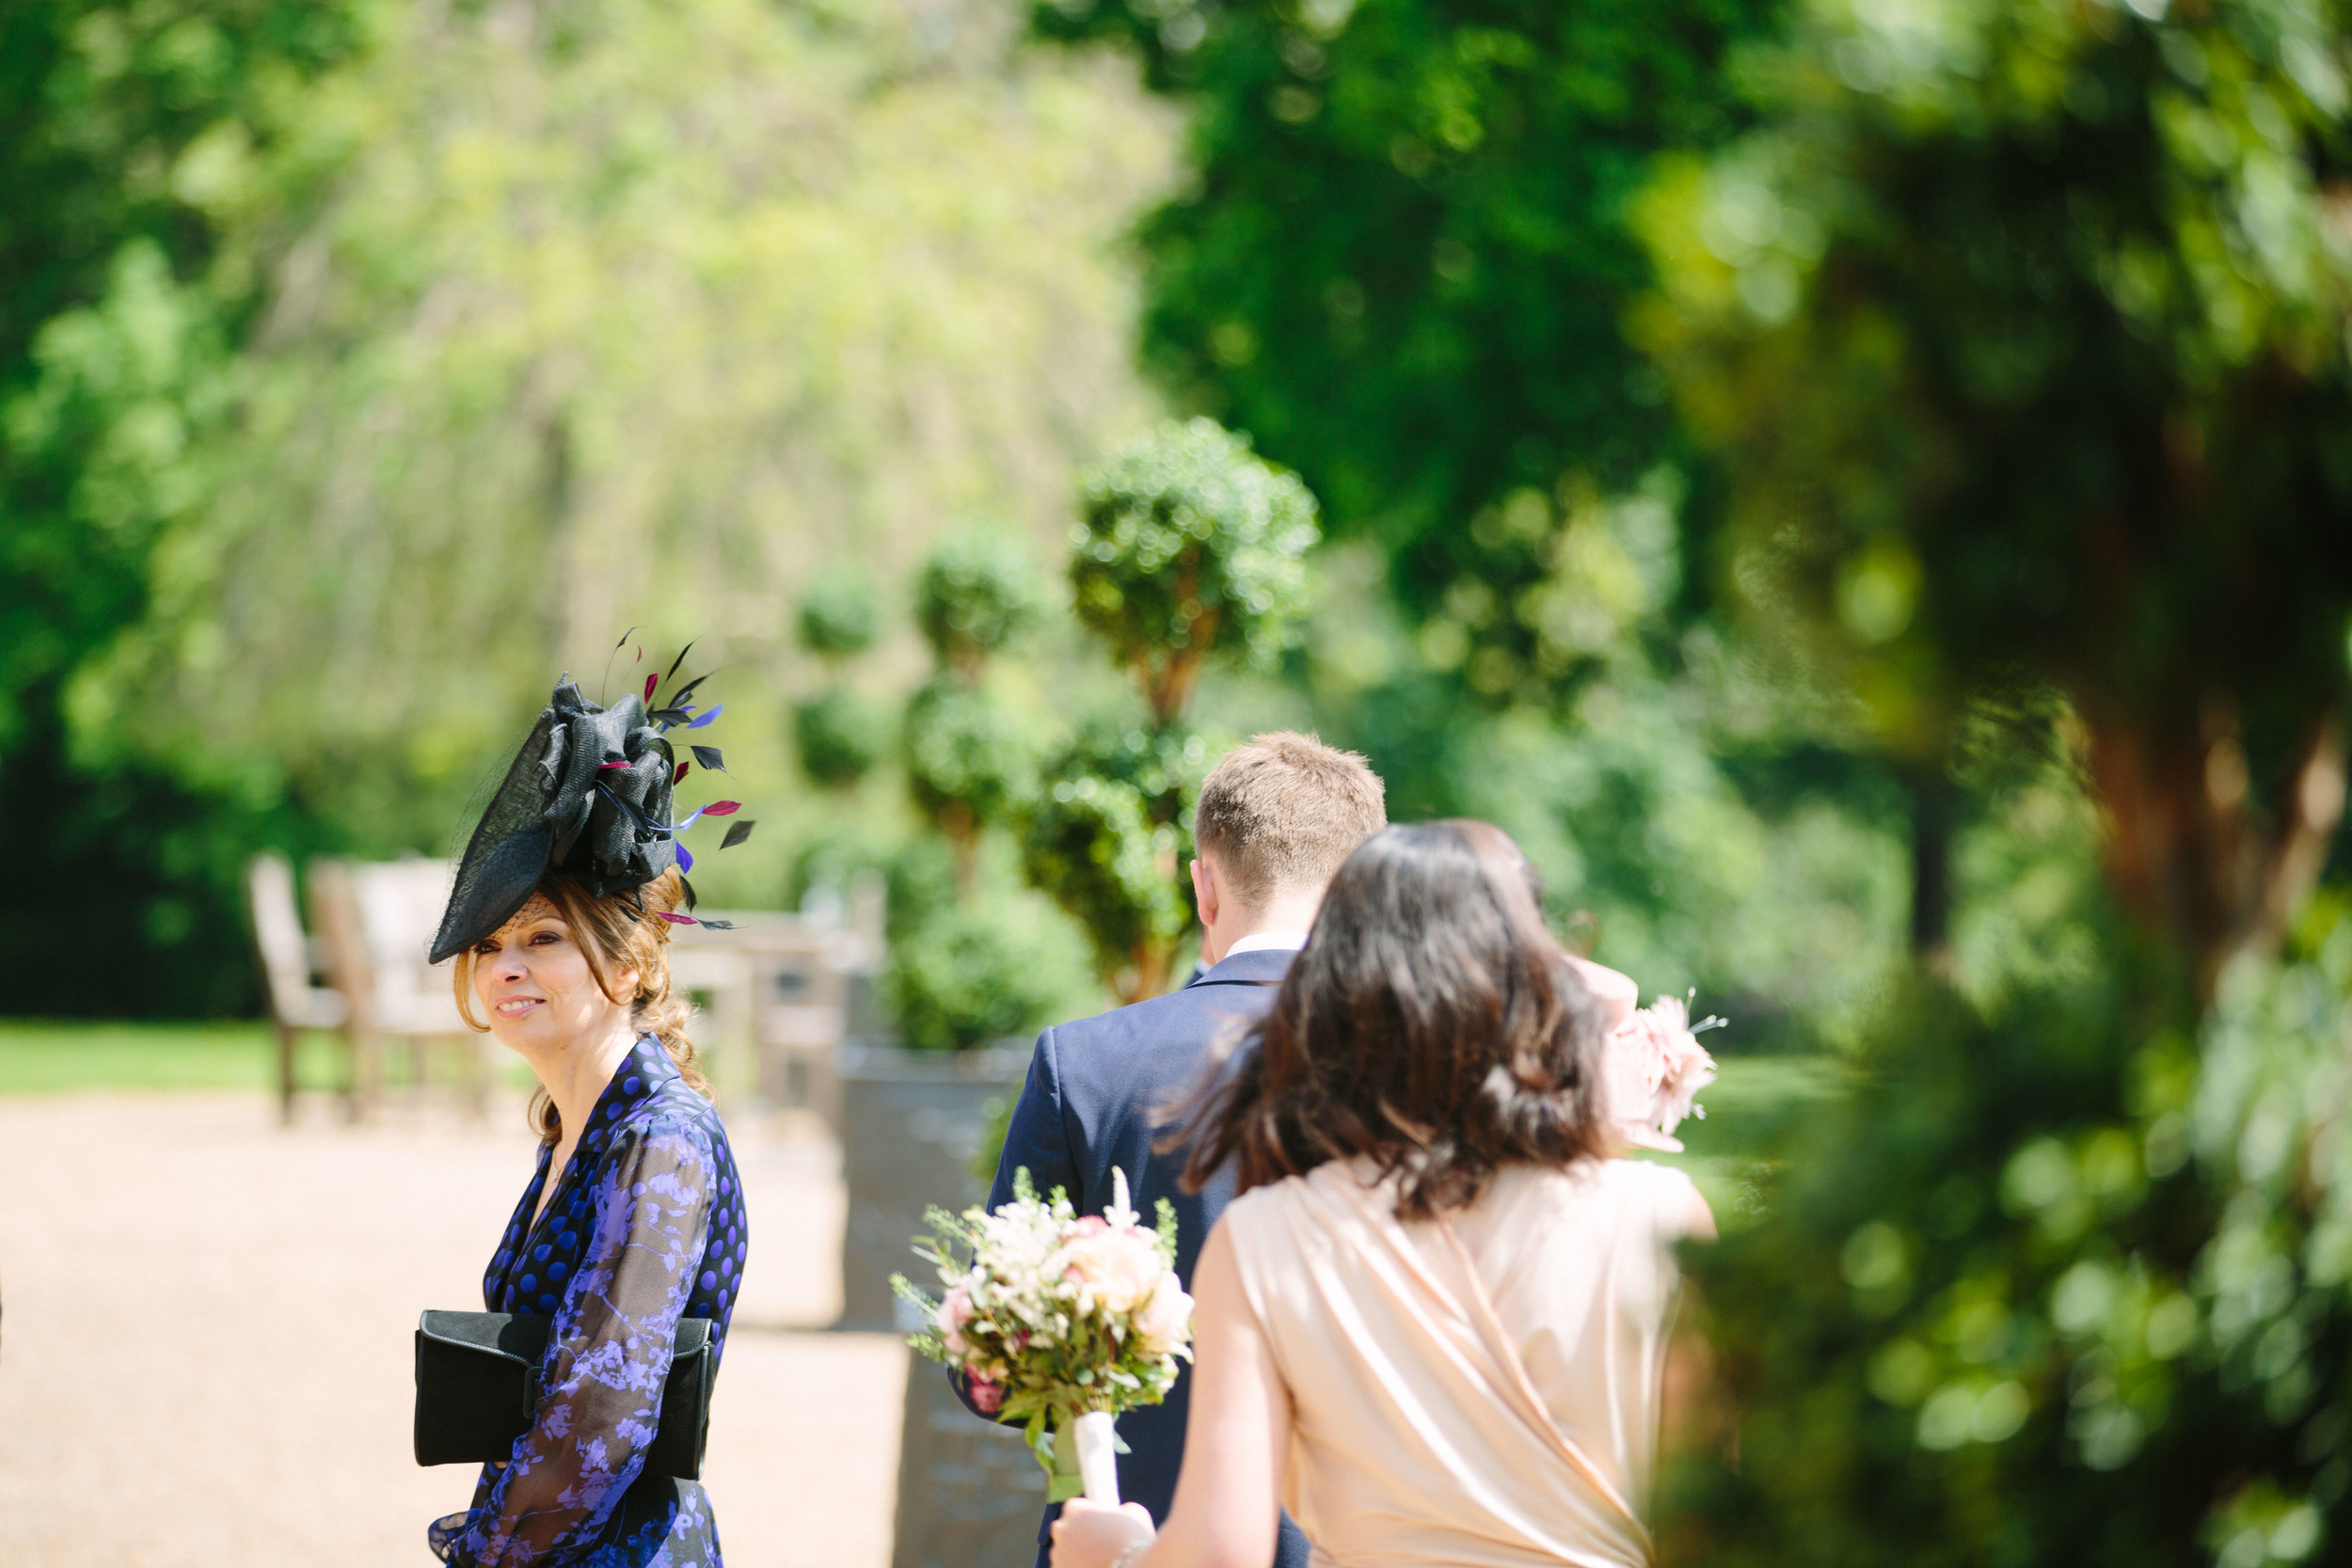 Woodlands-Park-Hotel-Cobham-Surrey-wedding-22